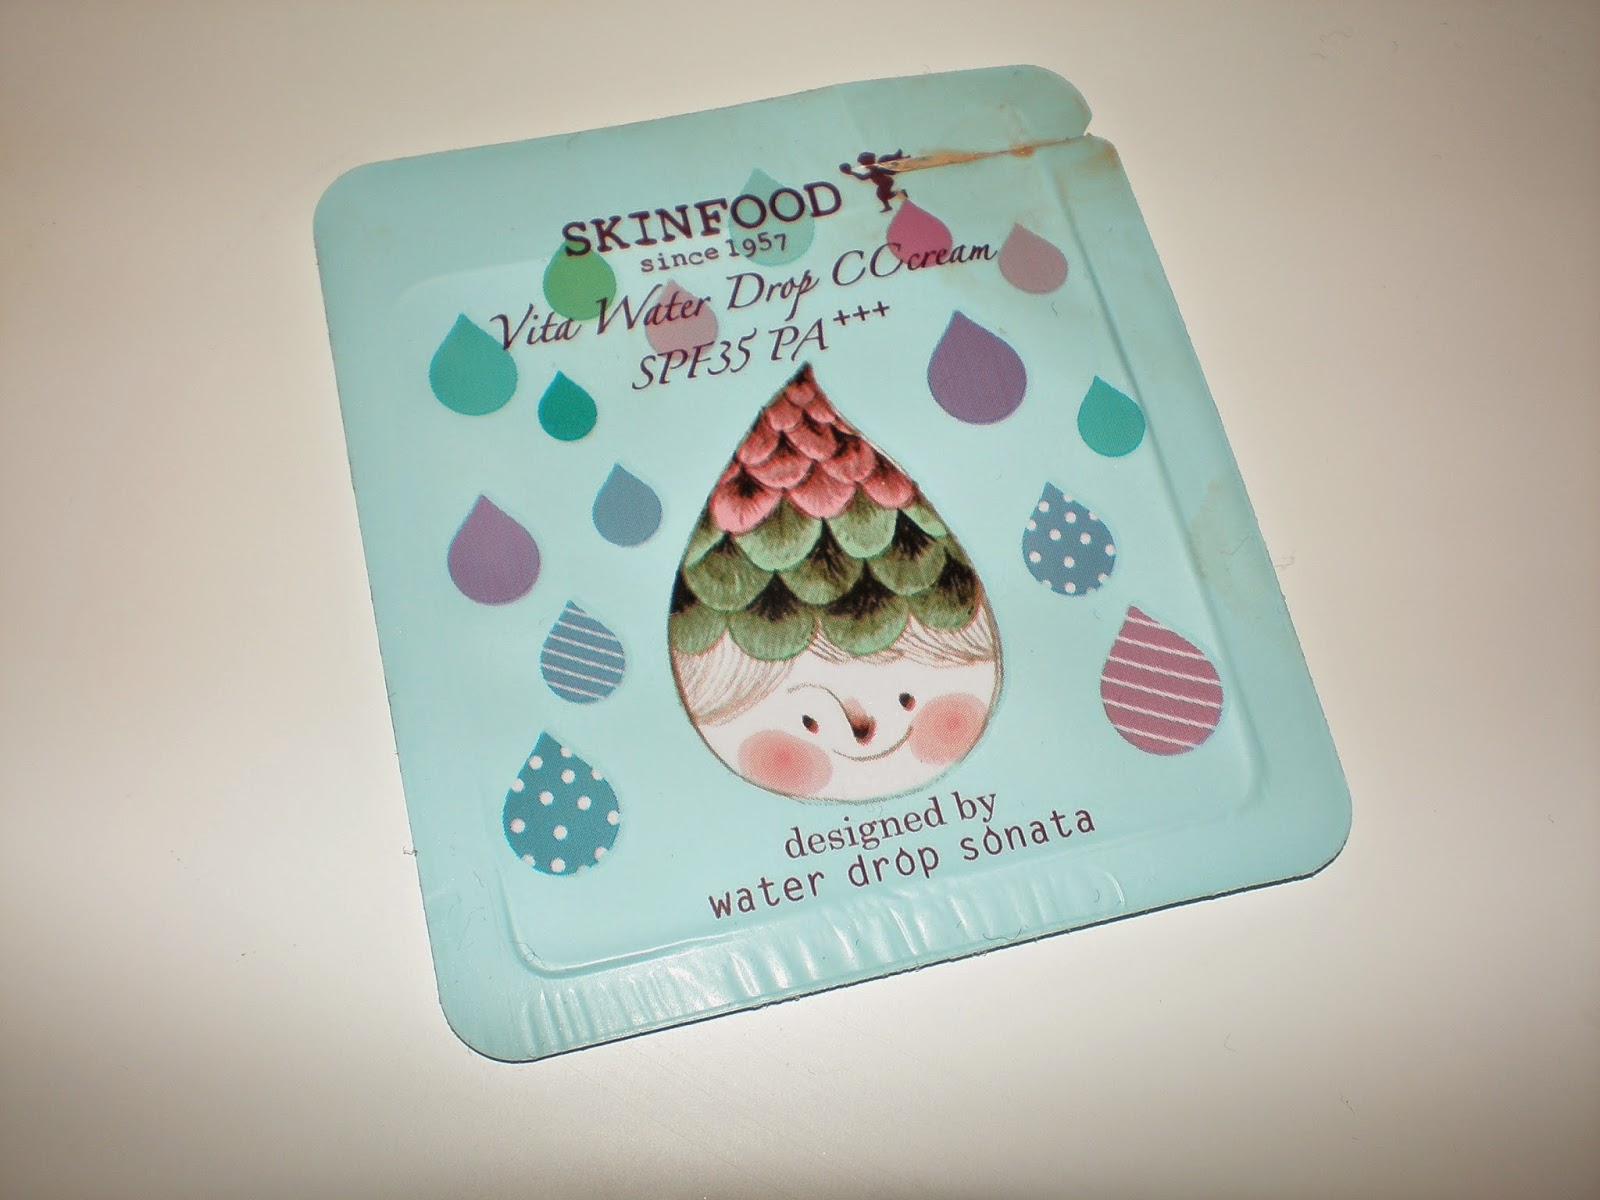 Skinfood Vita Water Drop CC cream SPF35 PA++